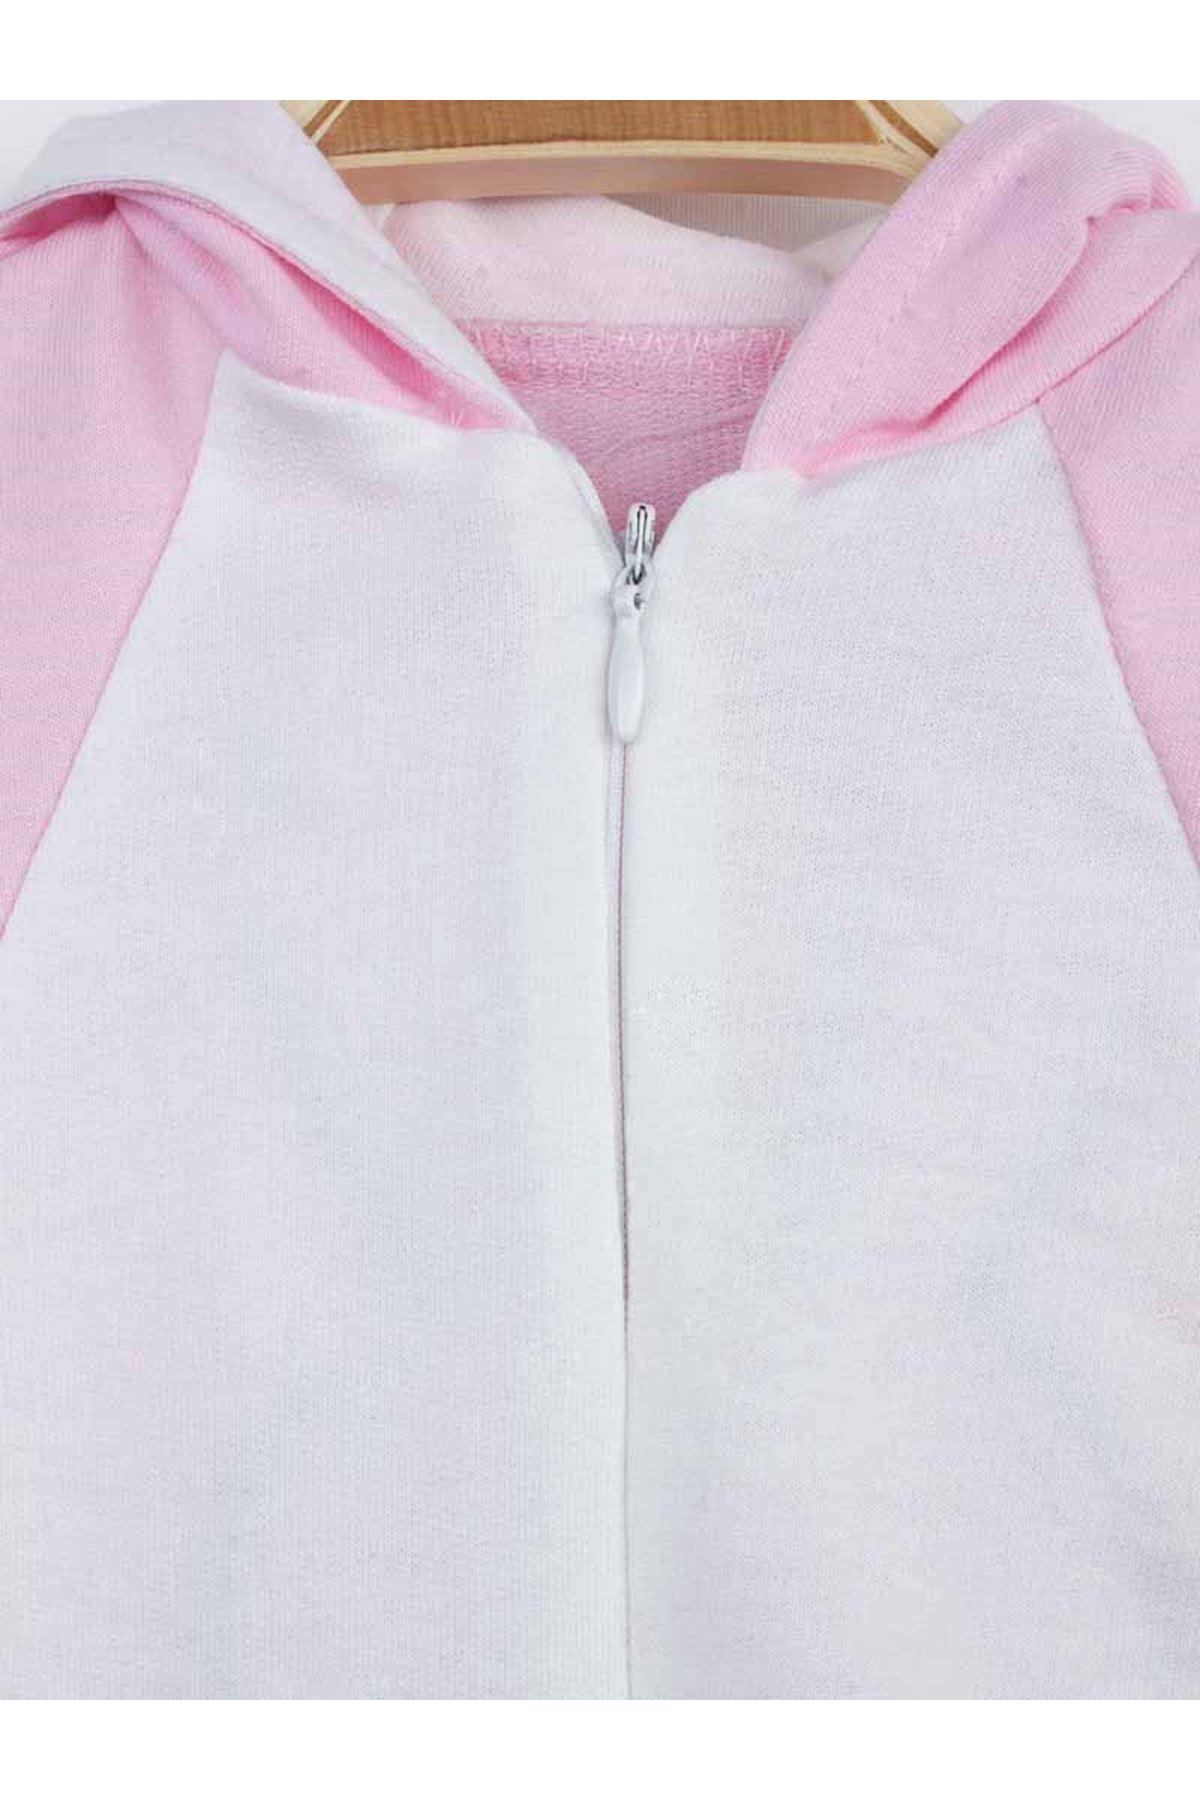 Pink Rabbit Ears Baby Girl Jumpsuit